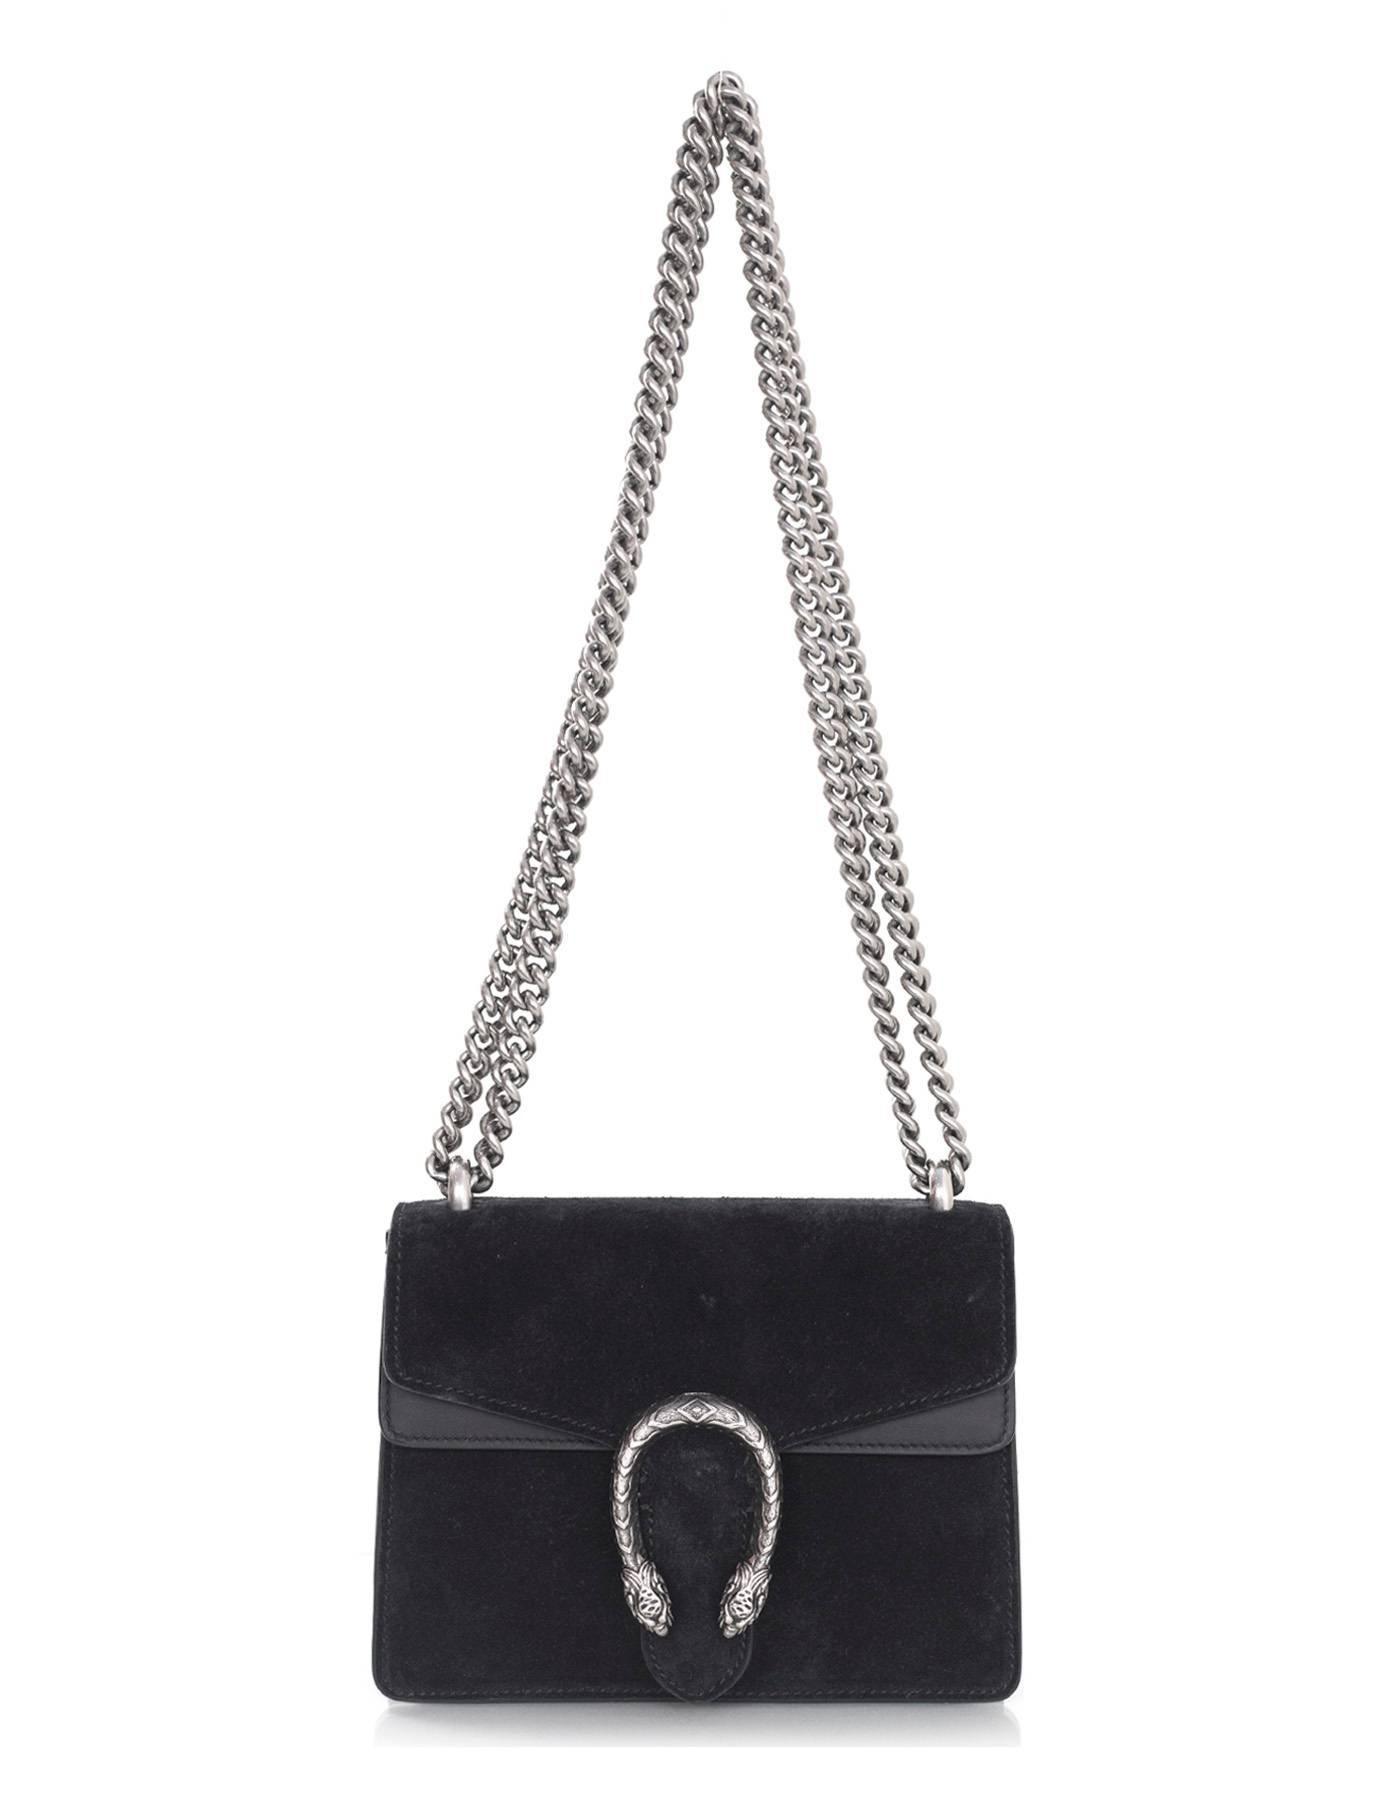 a5000e6ef69 Gucci Black Suede Dionysus Mini Flap Crossbody Bag For Sale at 1stdibs